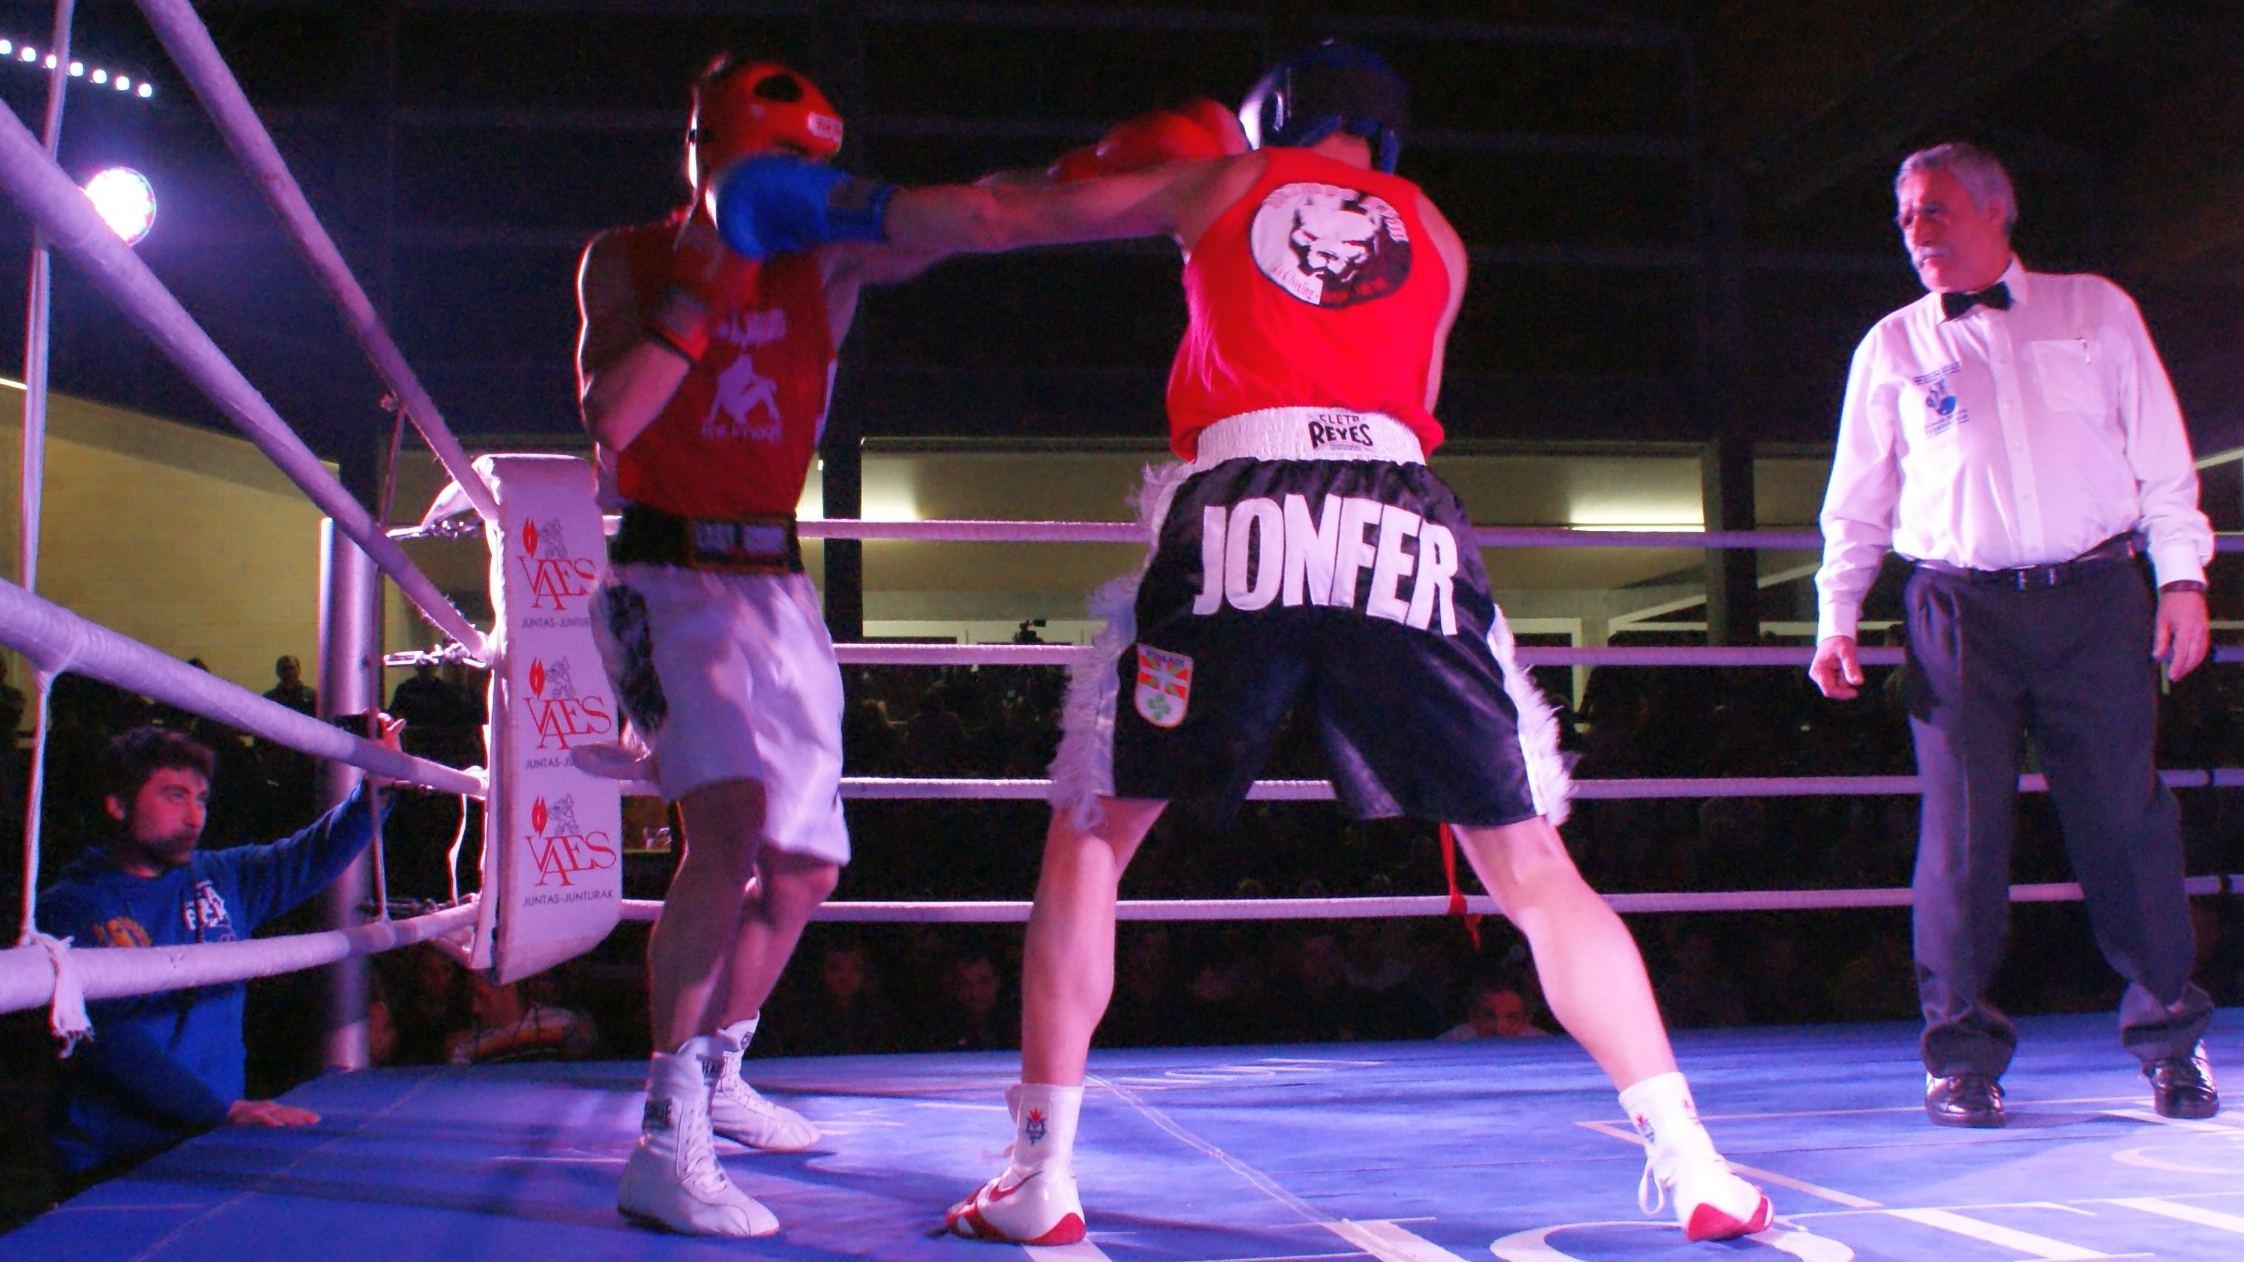 Boxeo Campeonatos de Bizkaia Zamudio Bilbao Junior JonFer